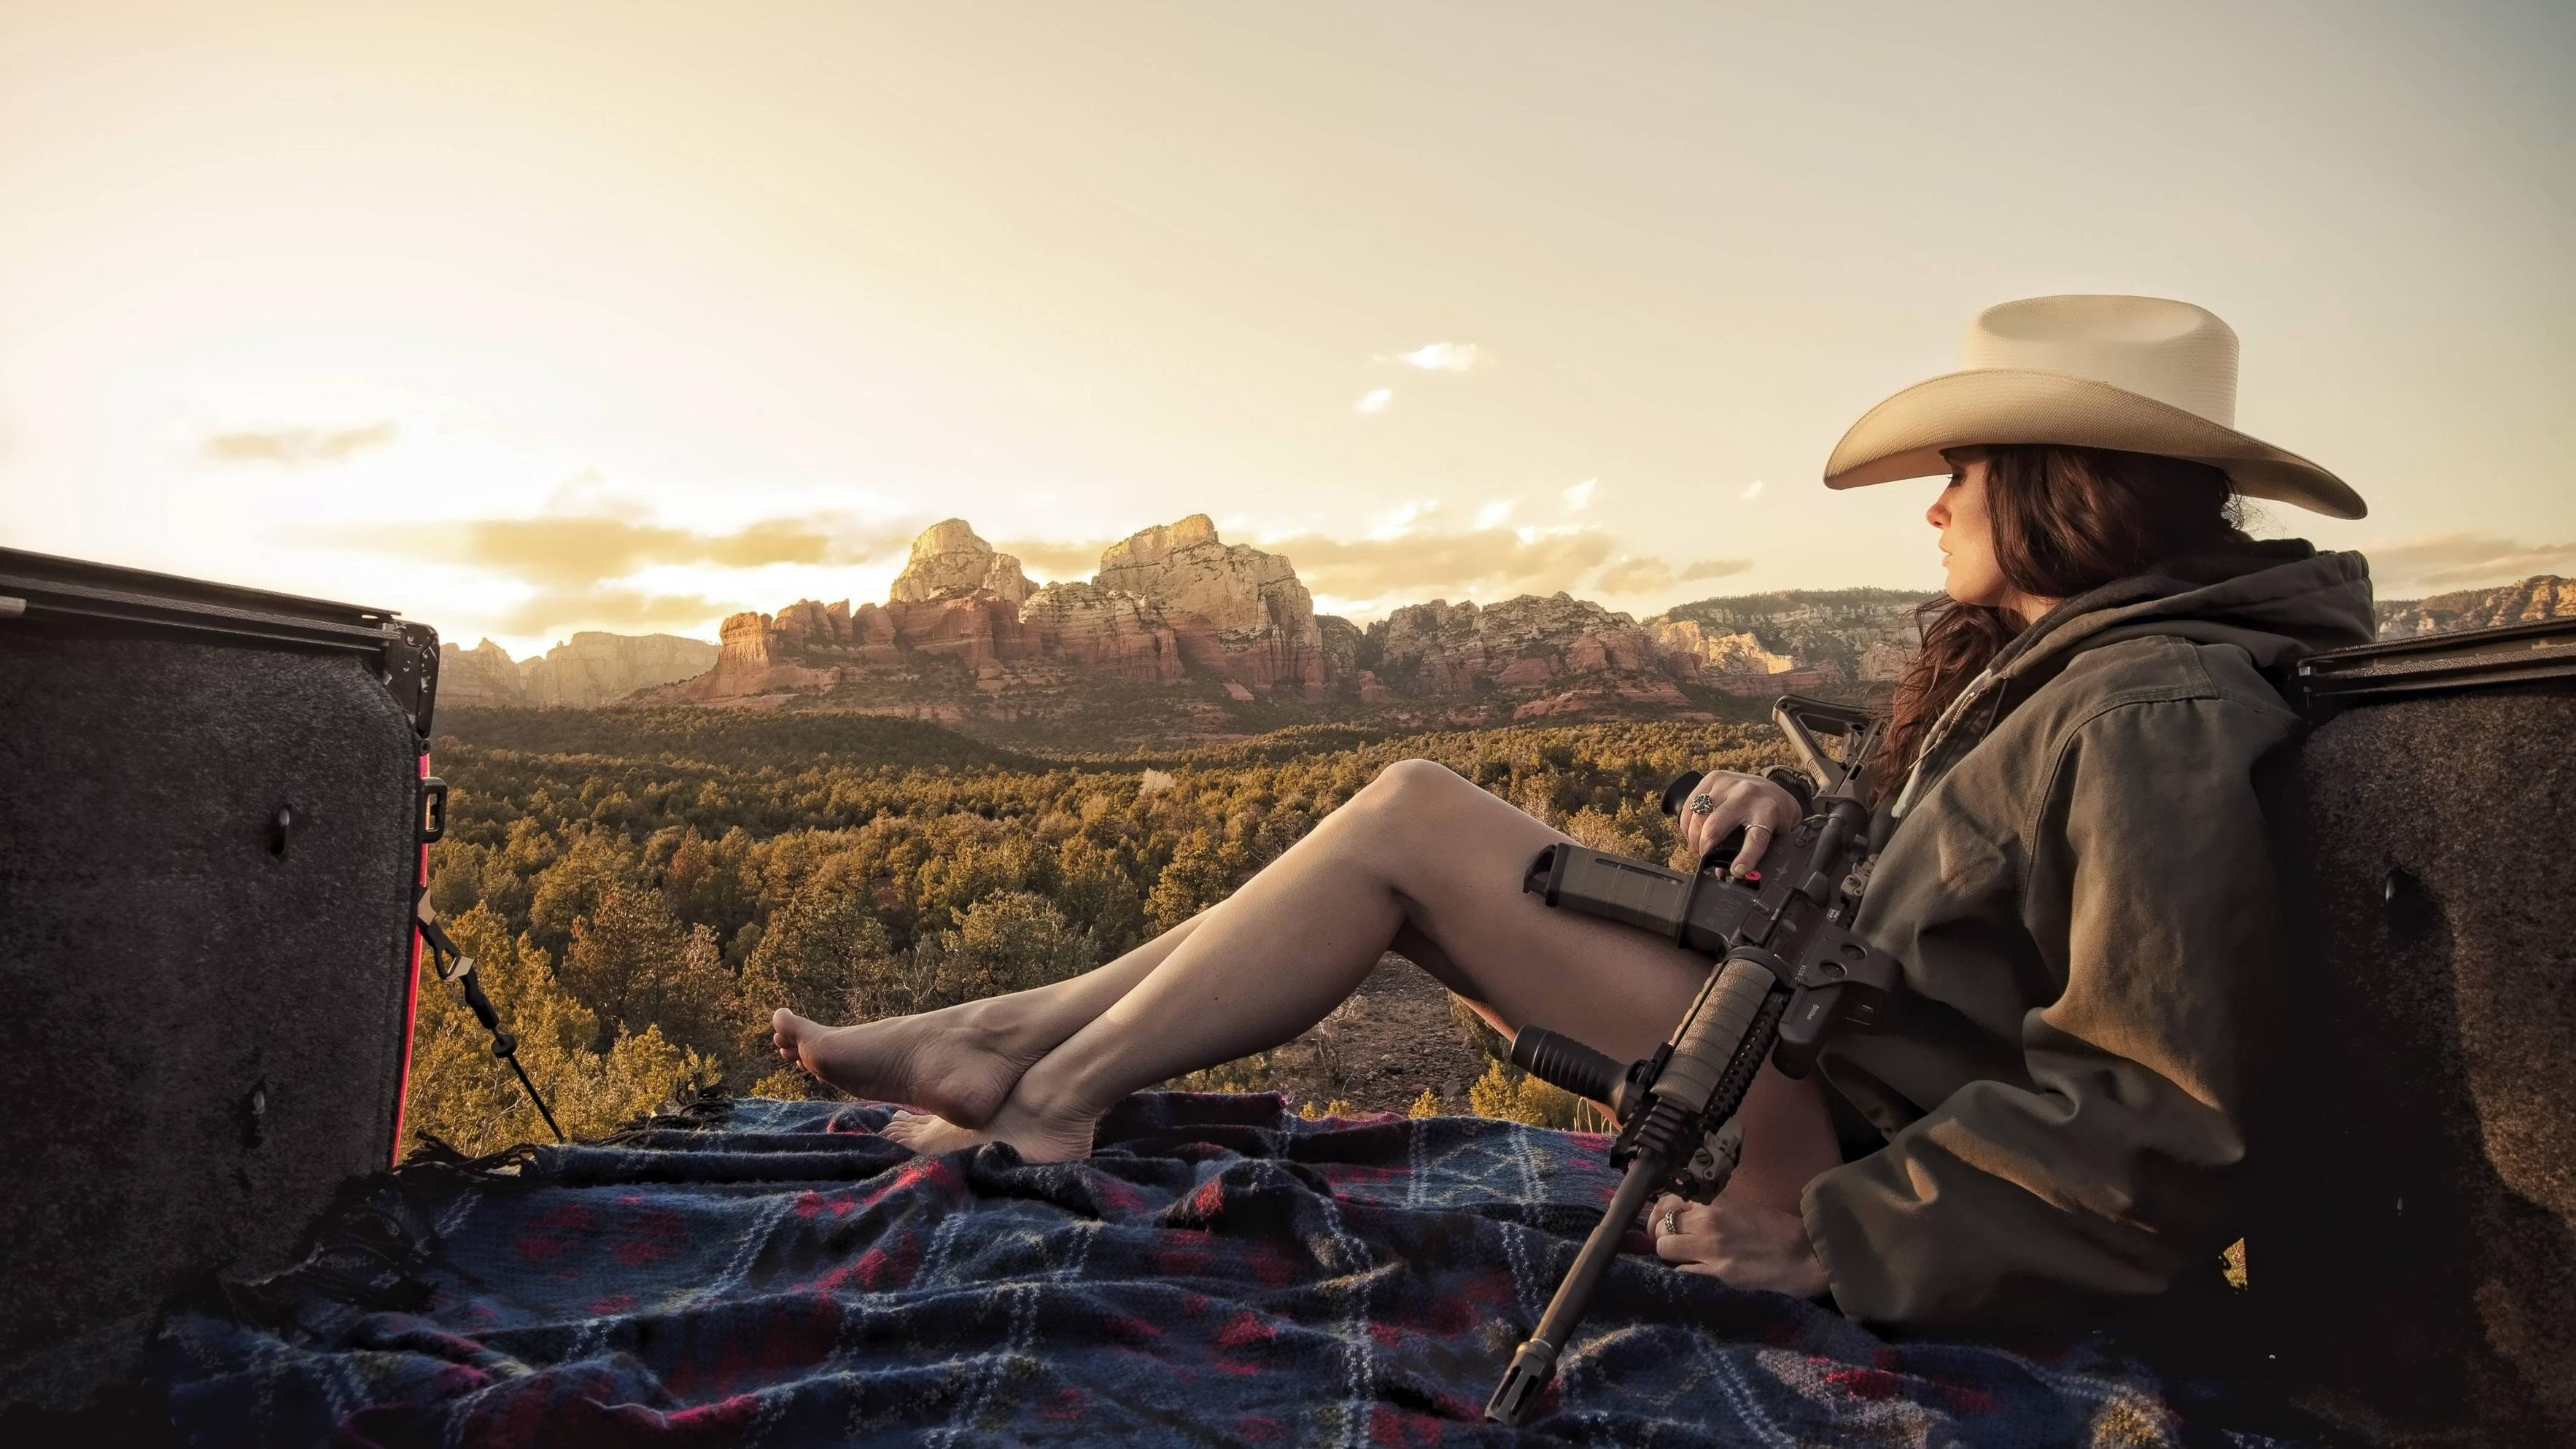 Women Landscapes Weapons Legs Cowboy Hats Feet AR15